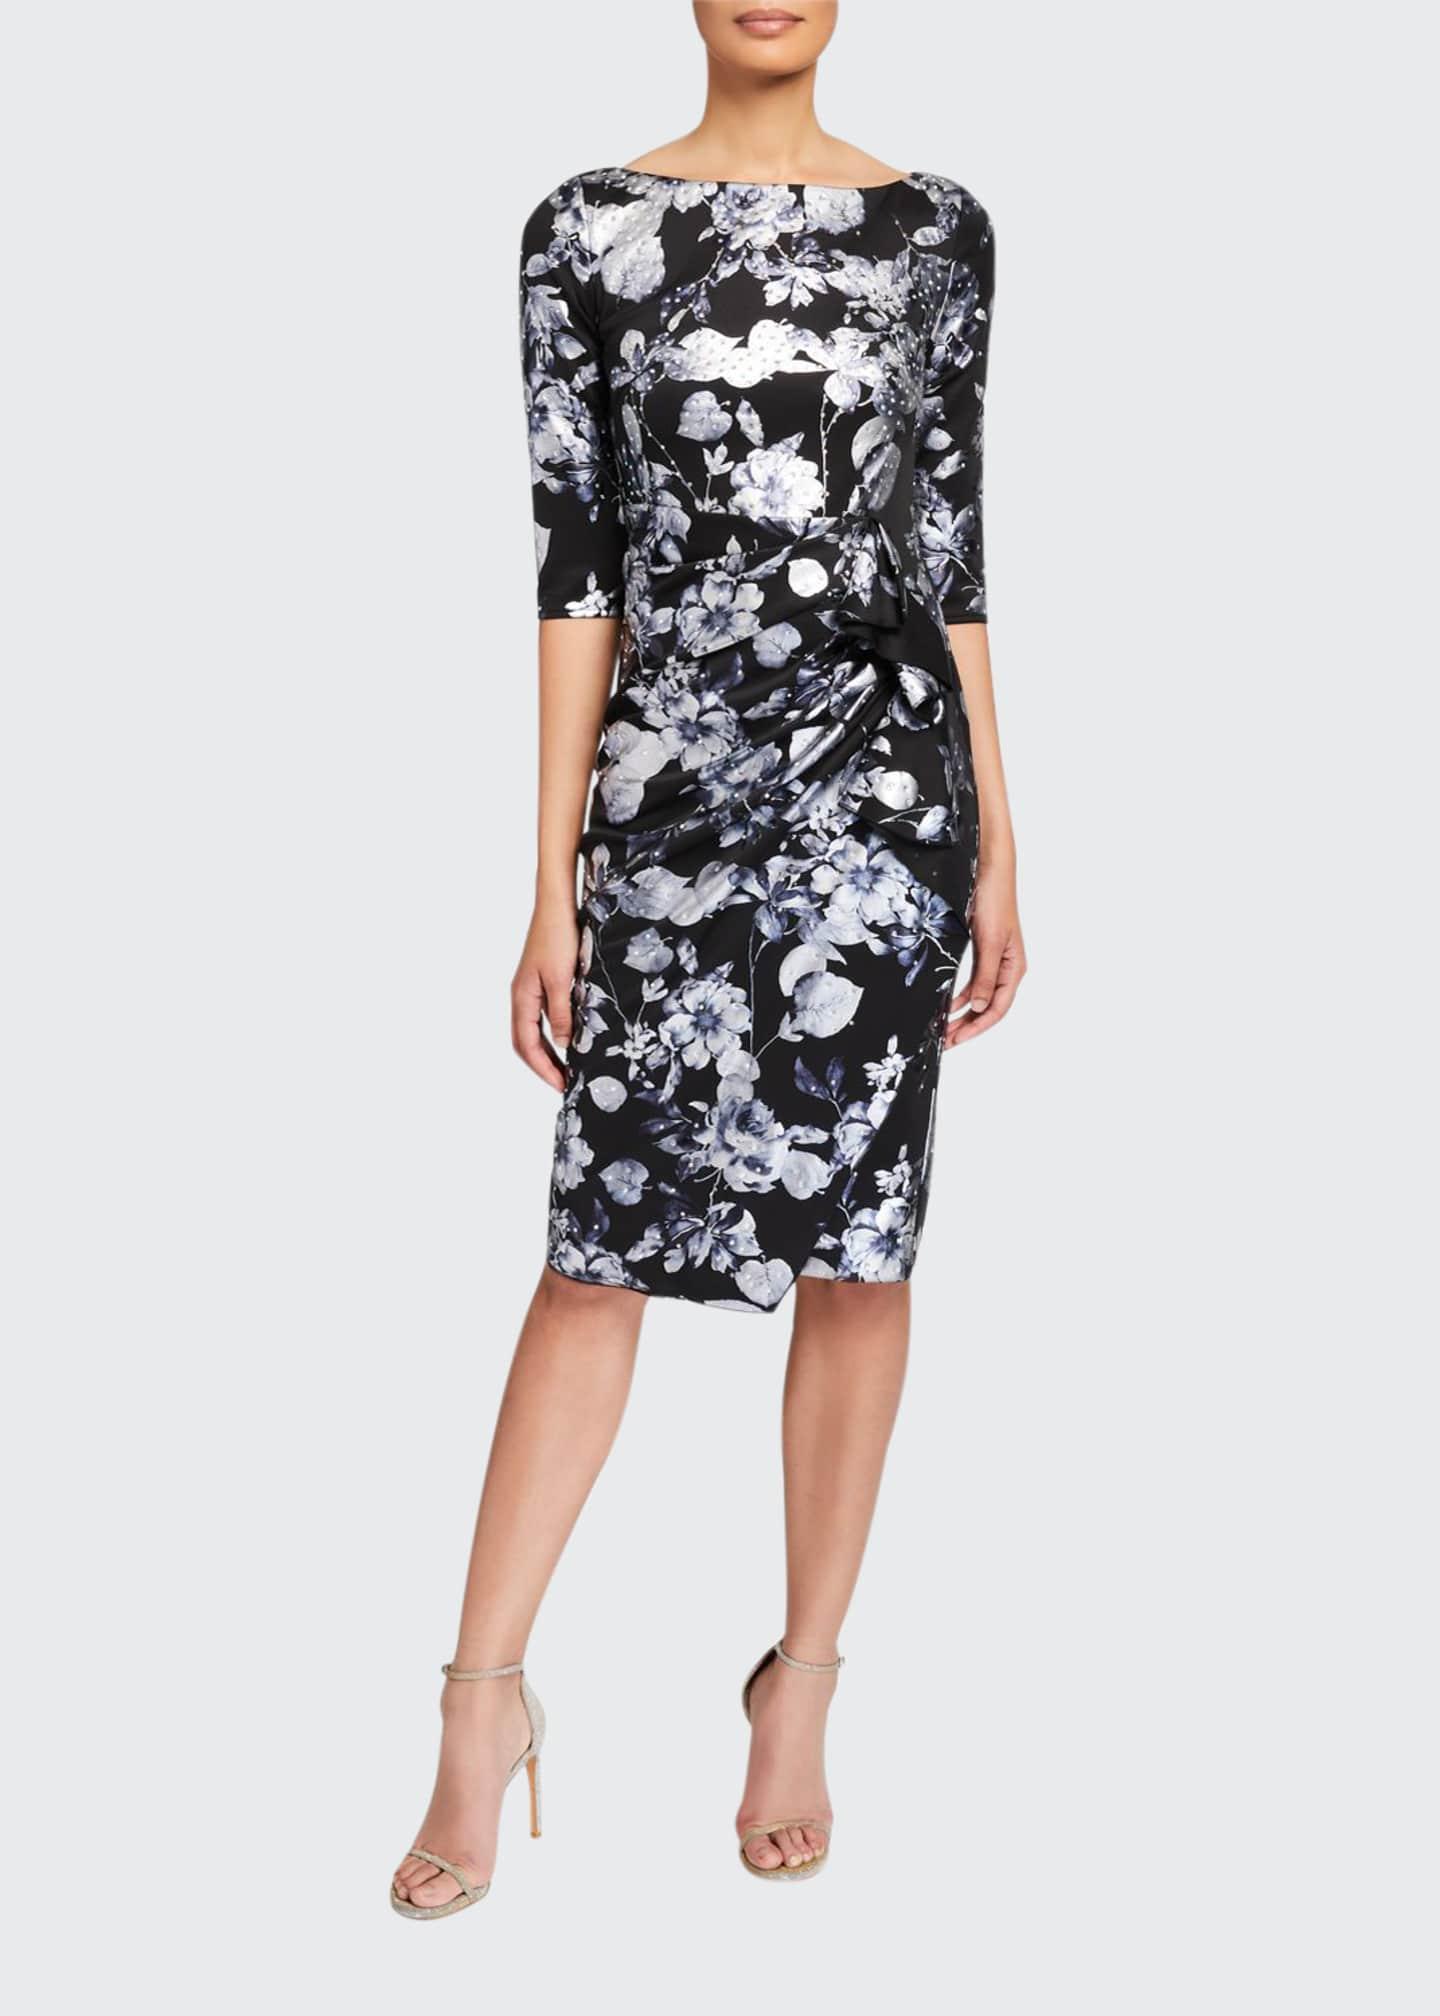 Jovani Stone Embellished Floral 3/4-Sleeve Dress w/ Drape